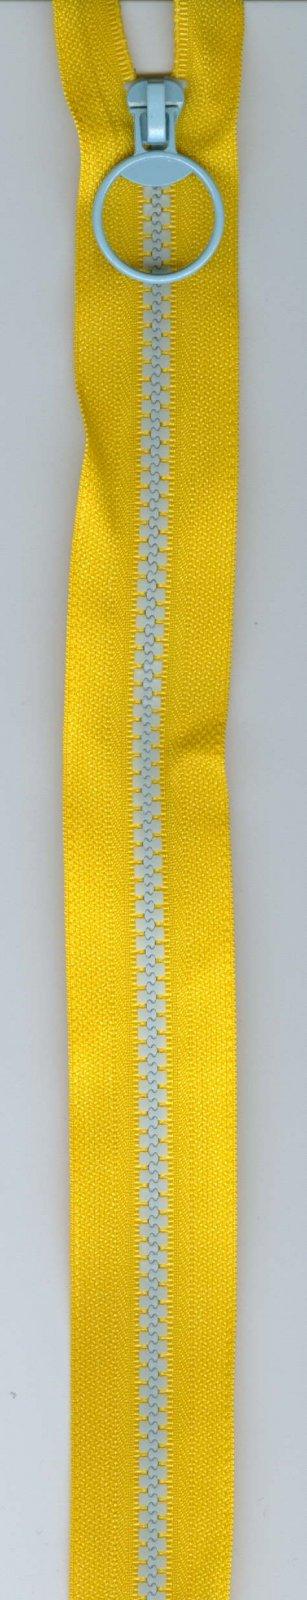 10 Zipper #5 - Yellow with Blue Teeth